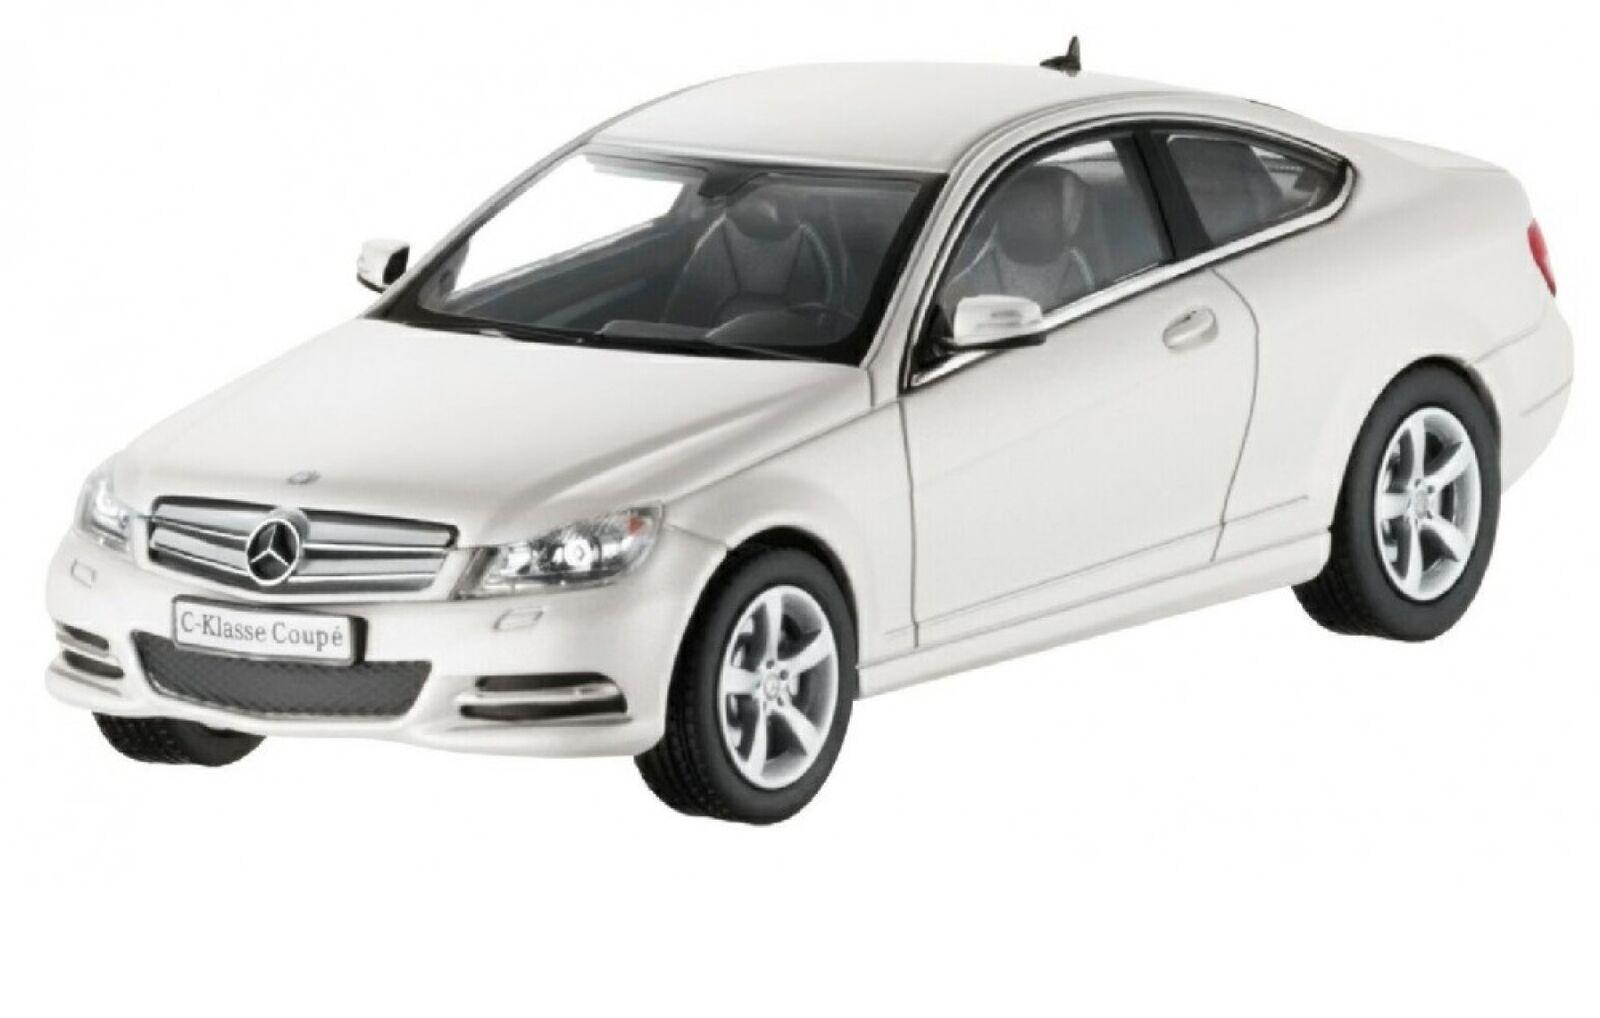 NOREV 1 43 Mercedes-Benz C-Class Coupé C204 - white genuine new